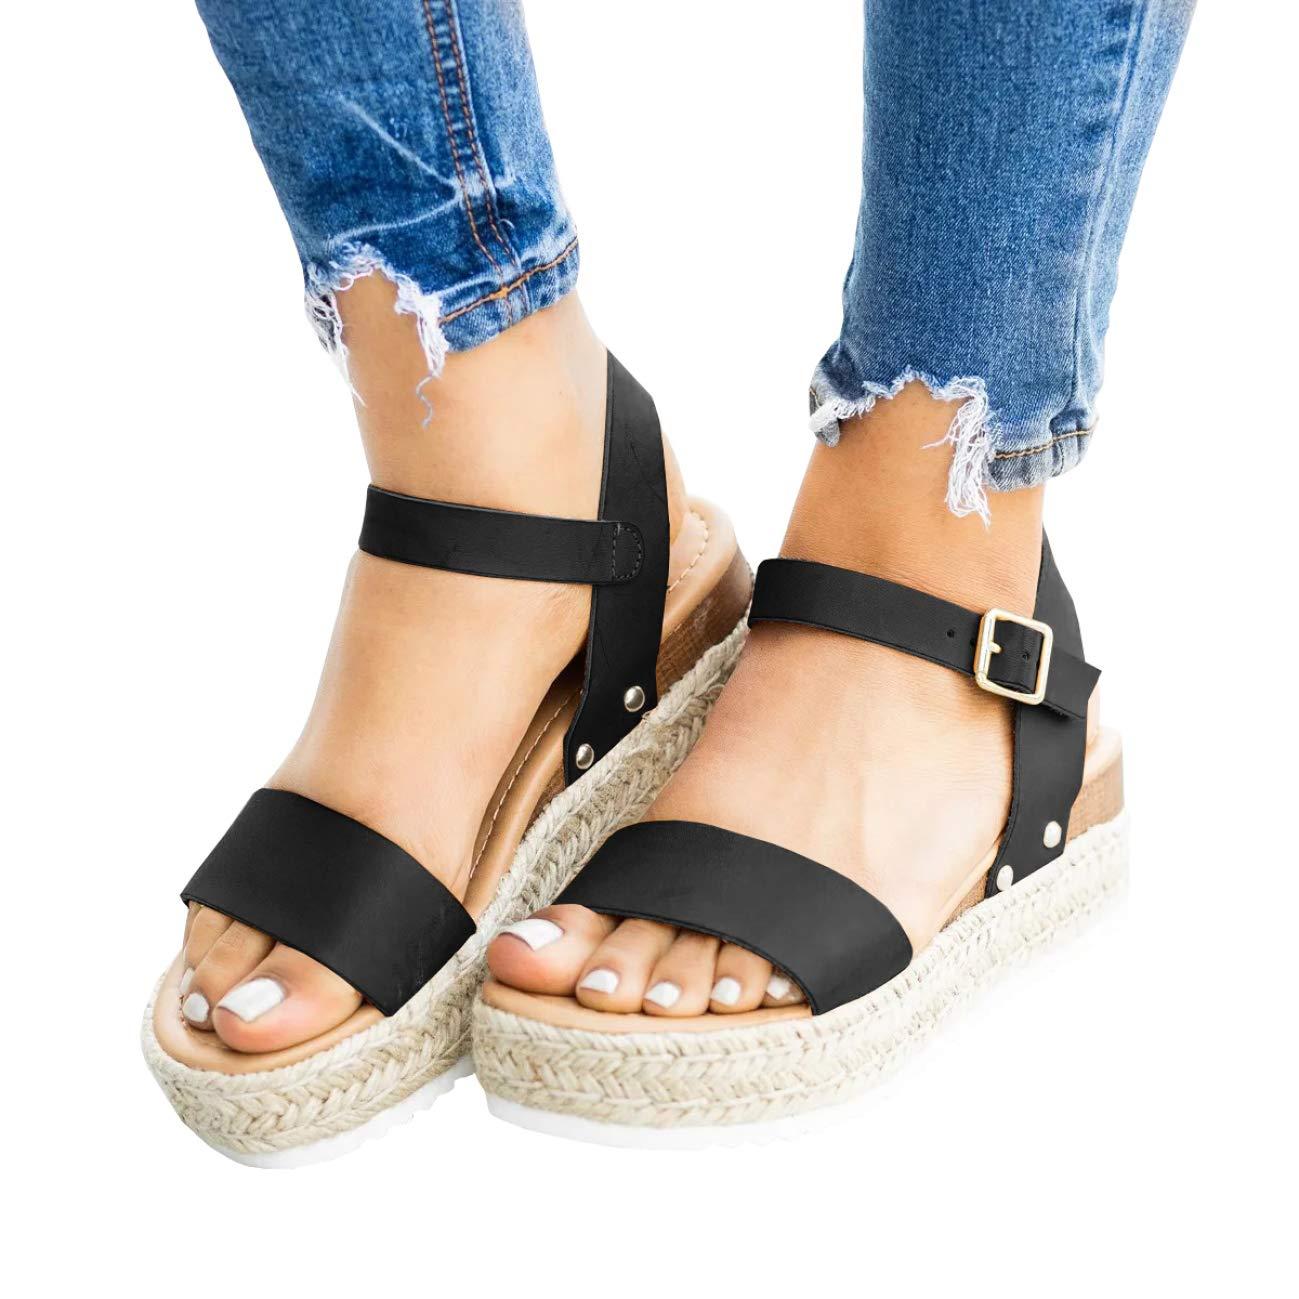 9f20d5f046e Womens Espadrilles Open Toe Platform Wedge Sandals Ankle Strap Slingback  Dress Shoes